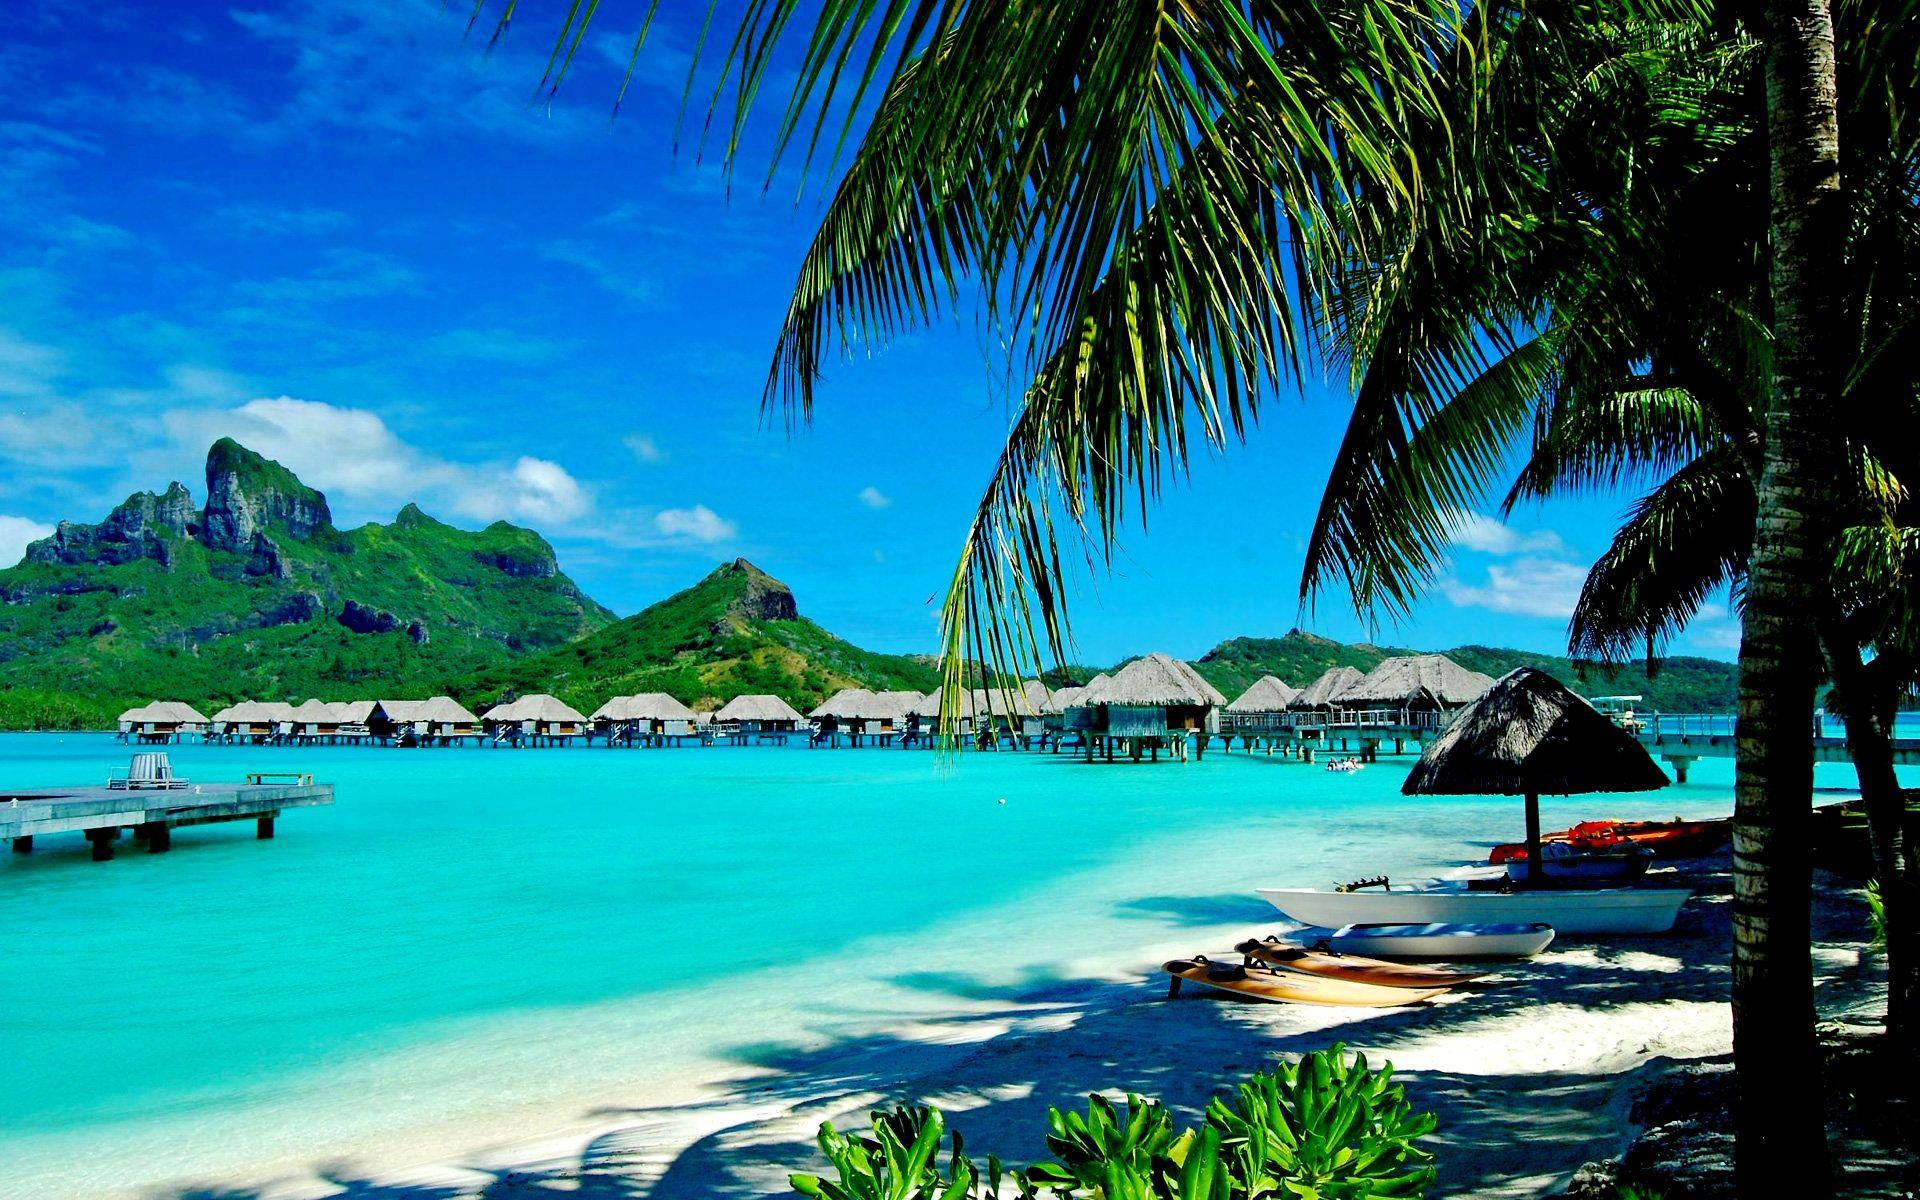 Bora Bora Island In Tahiti, French Polynesia